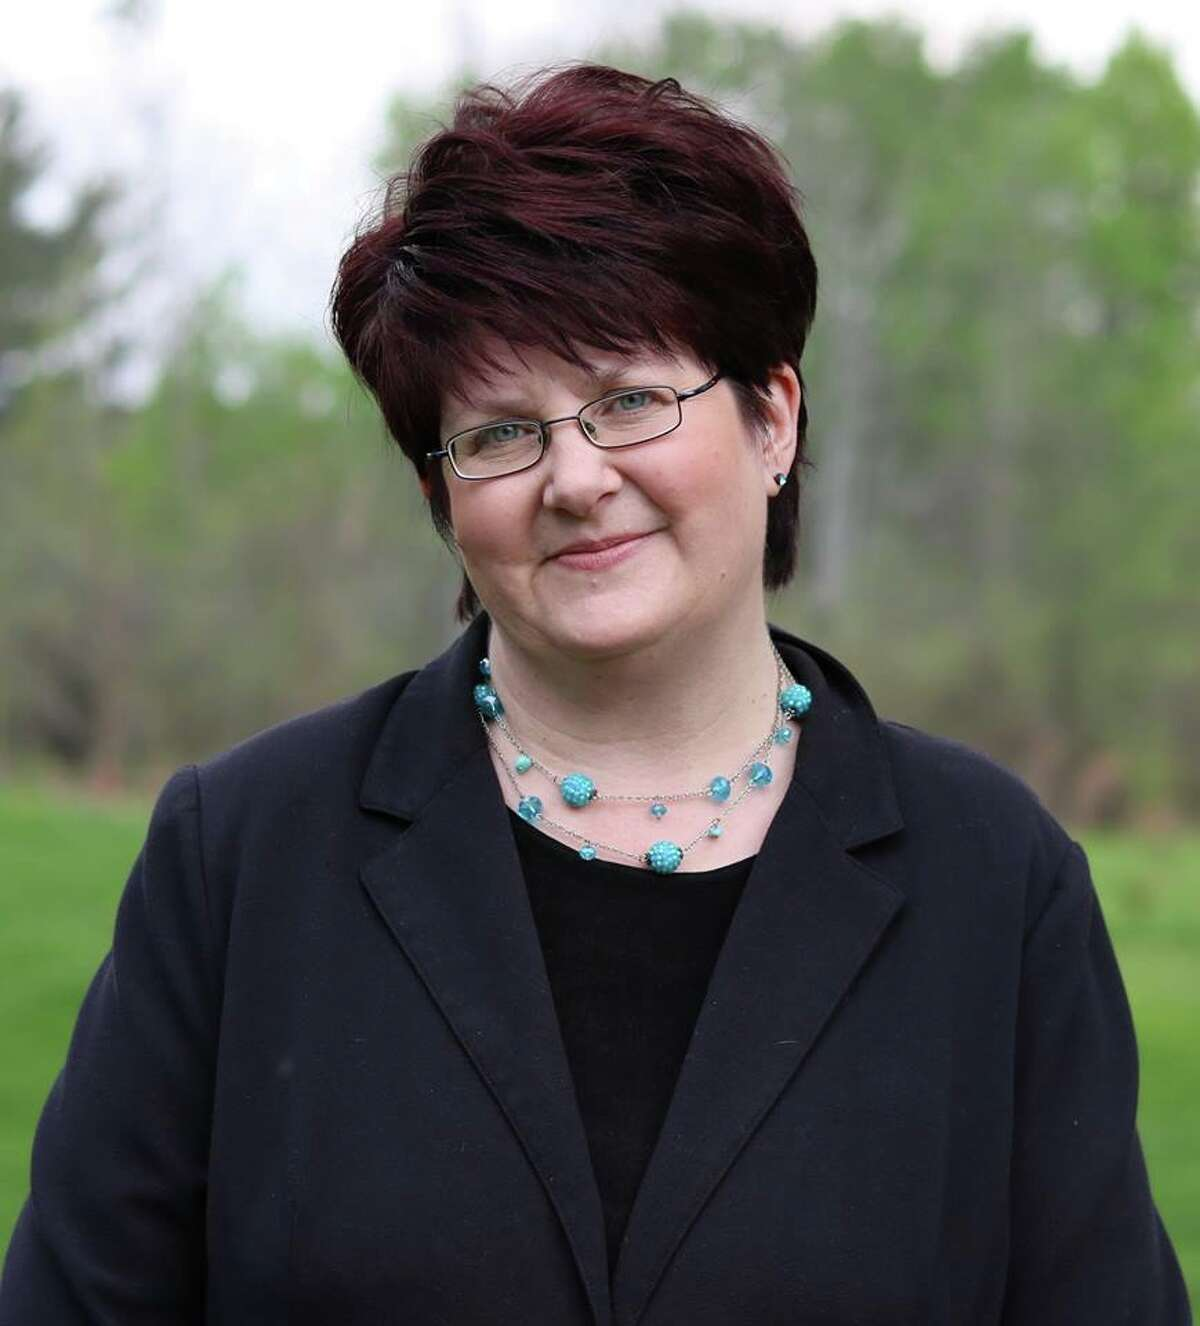 Republican Scotia mayoral candidate Loretta Rigney was defeated by Tom Gifford, a Democrat.